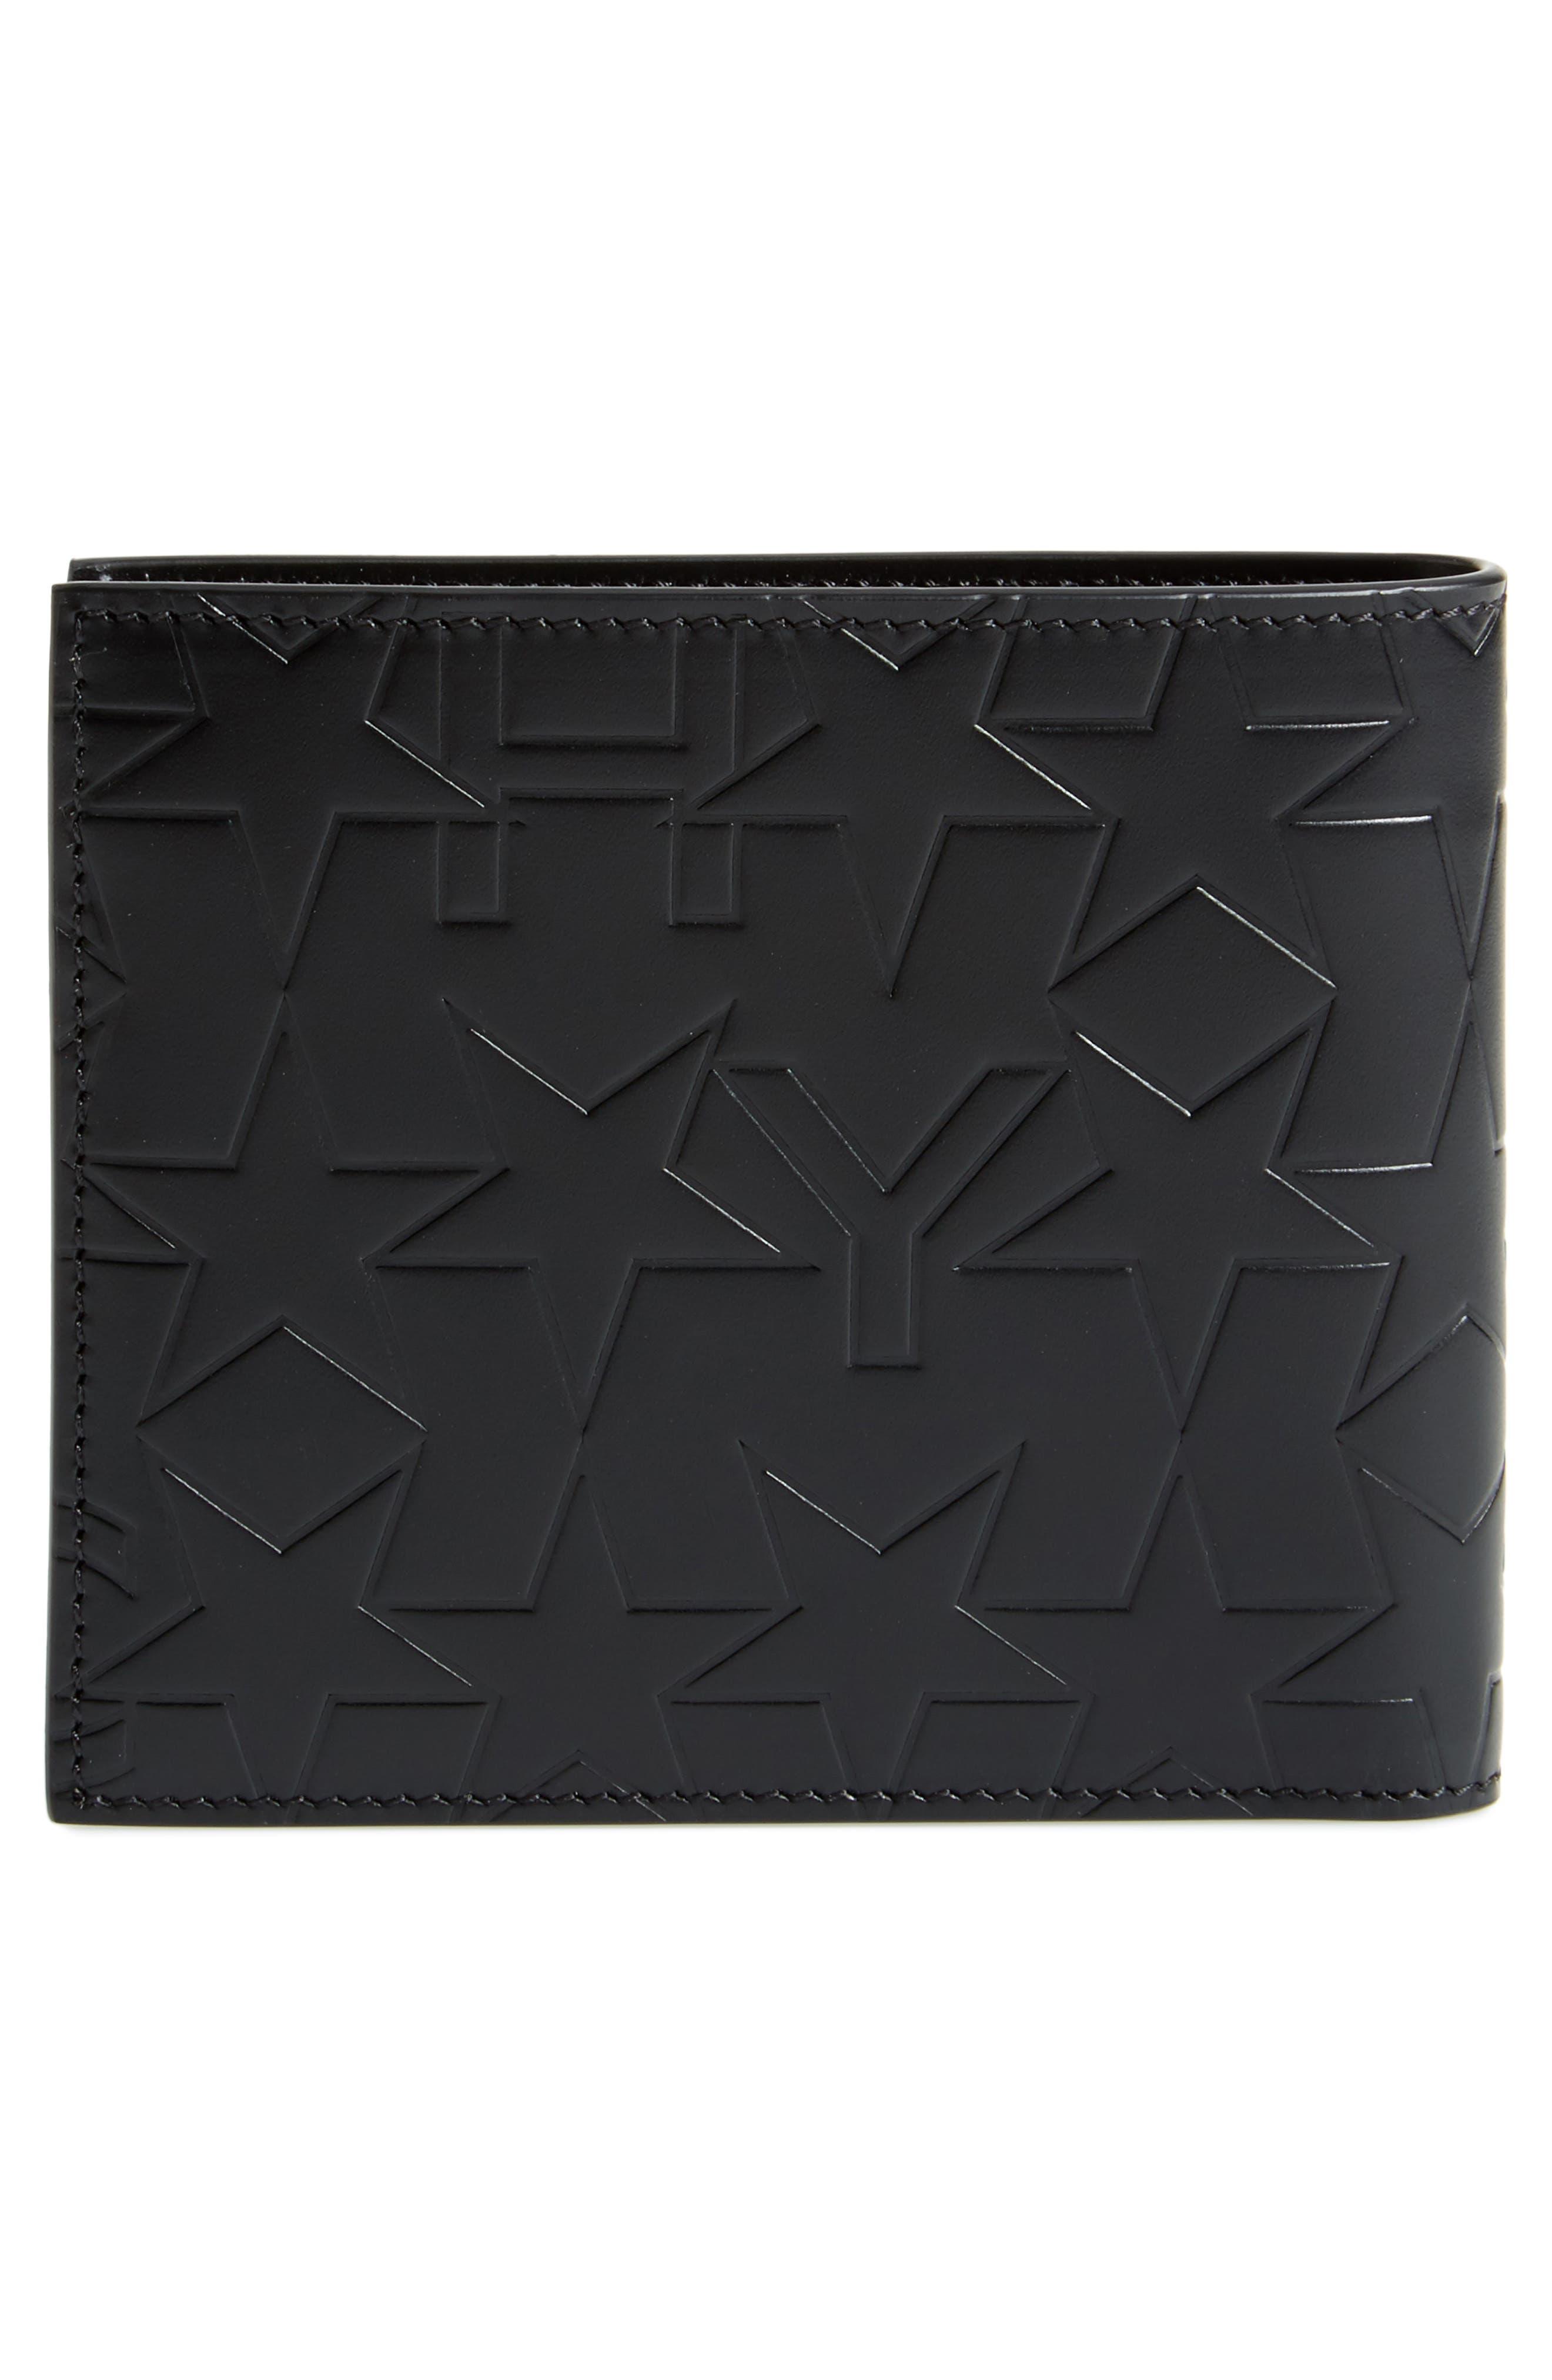 Leather Billfold Wallet,                             Alternate thumbnail 3, color,                             Black